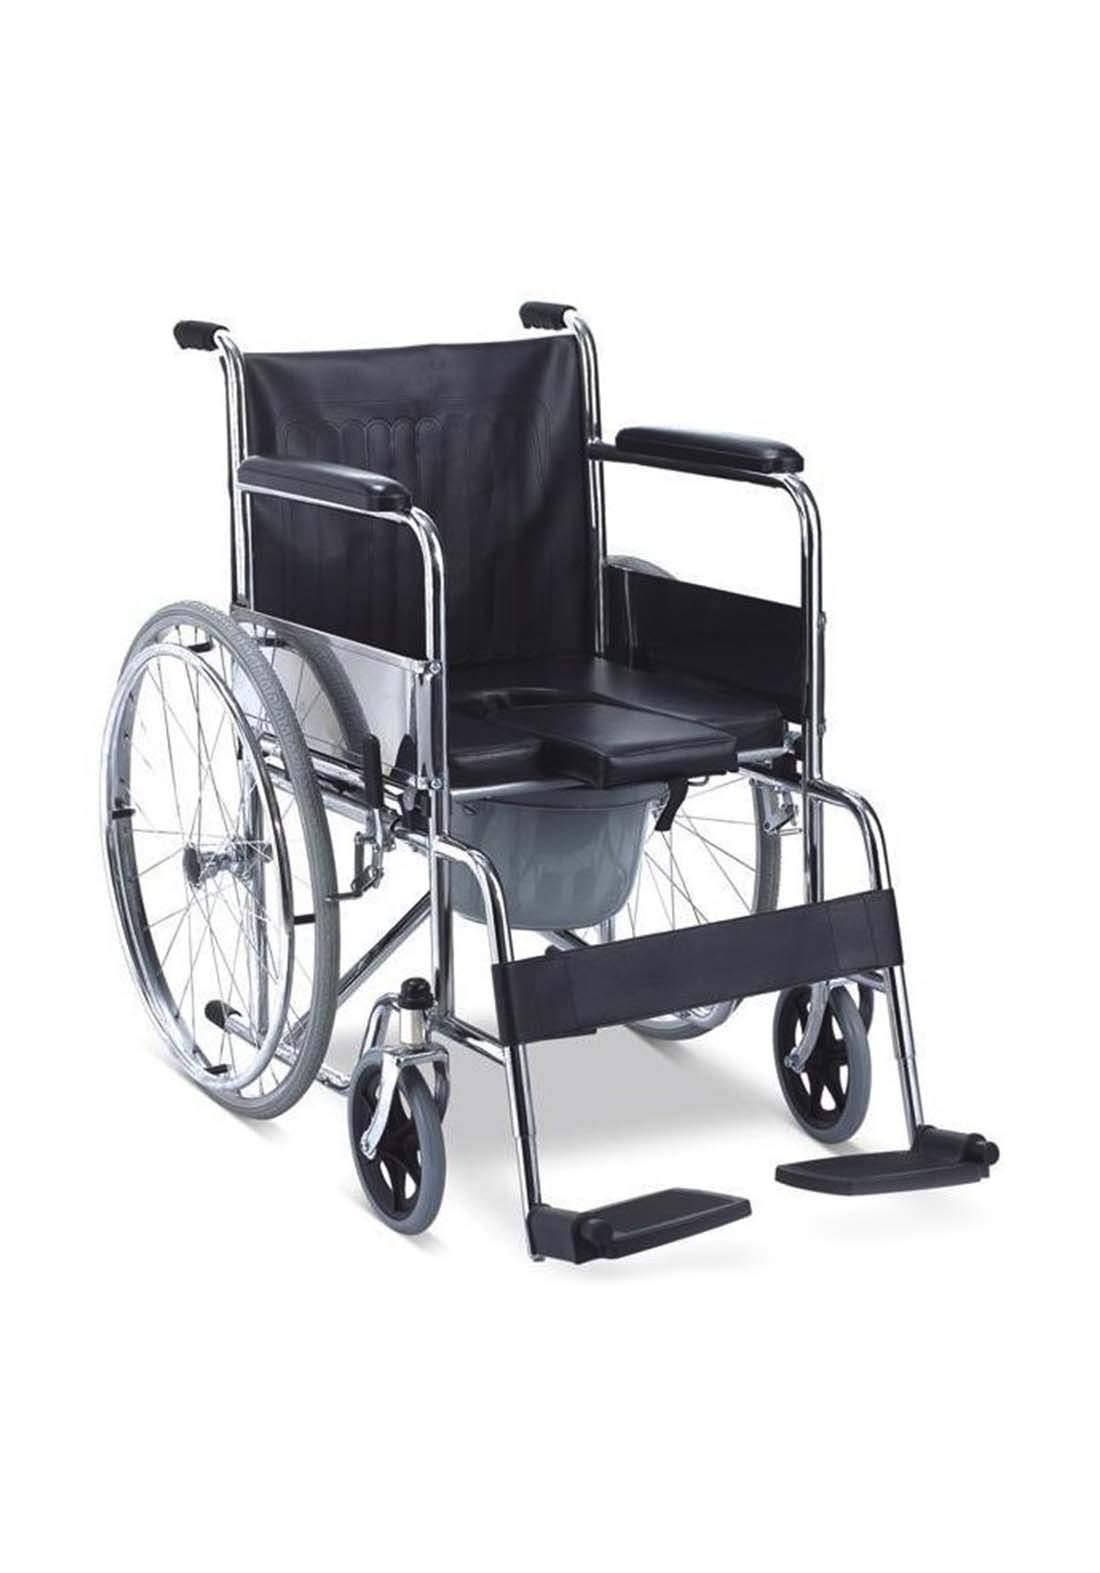 Foshan Fs609 Wheel Chair  1 Pc كرسي متحرك